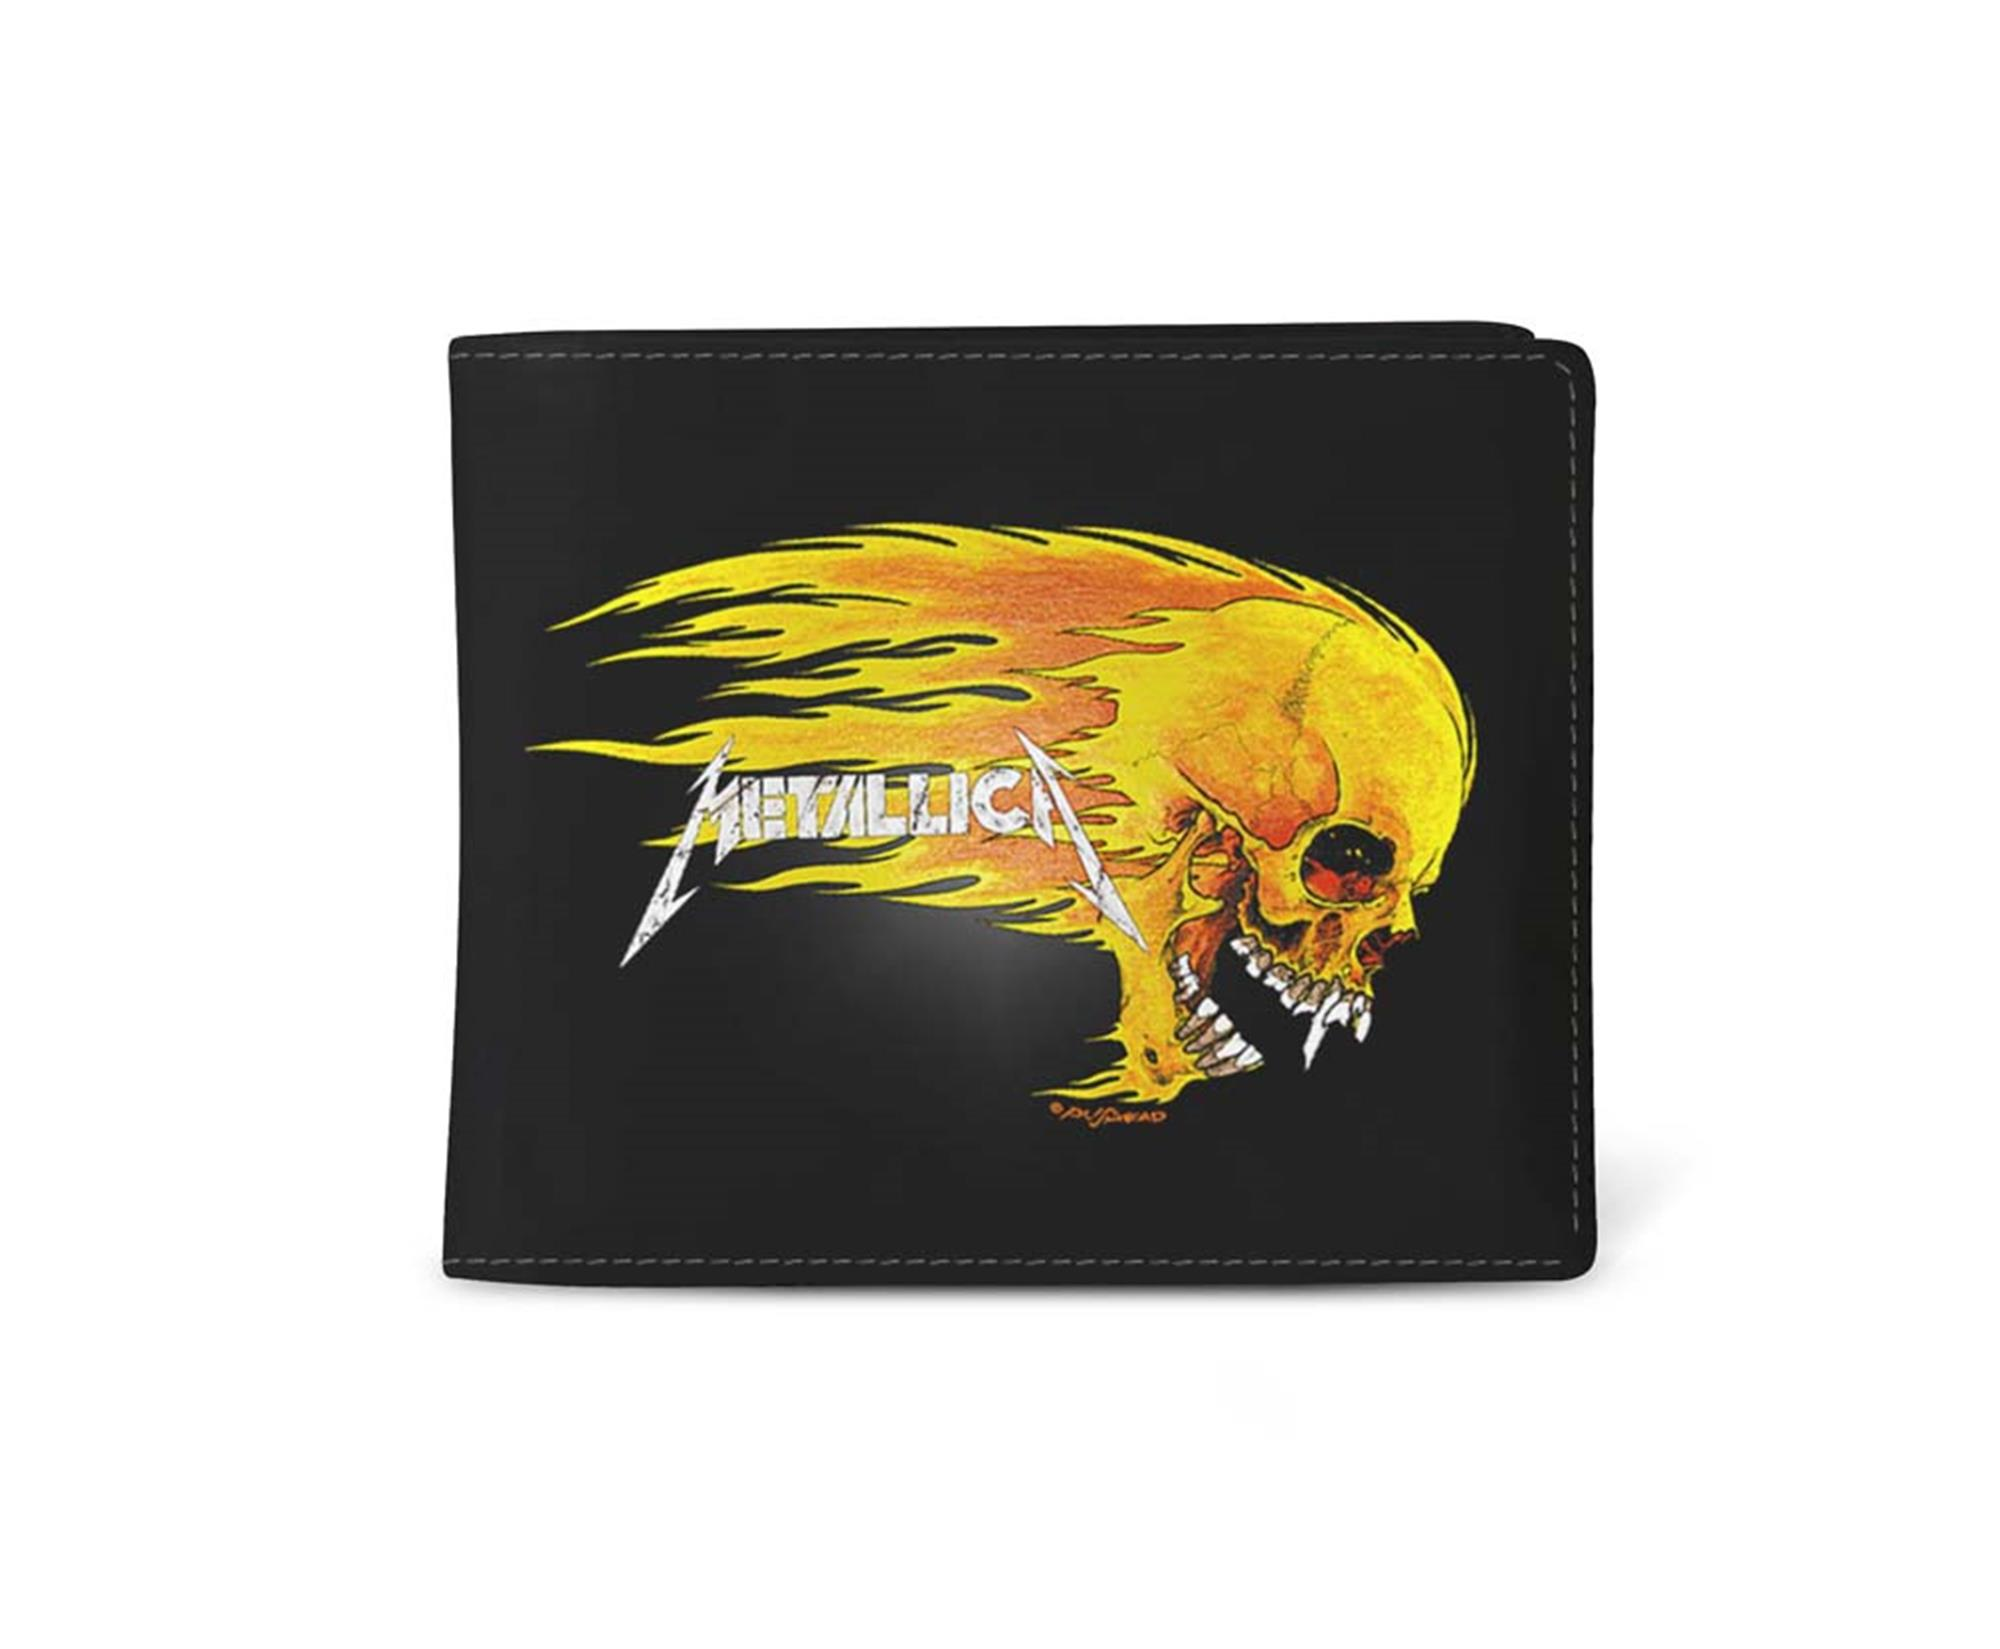 Metallica Pushead Flame Wallet